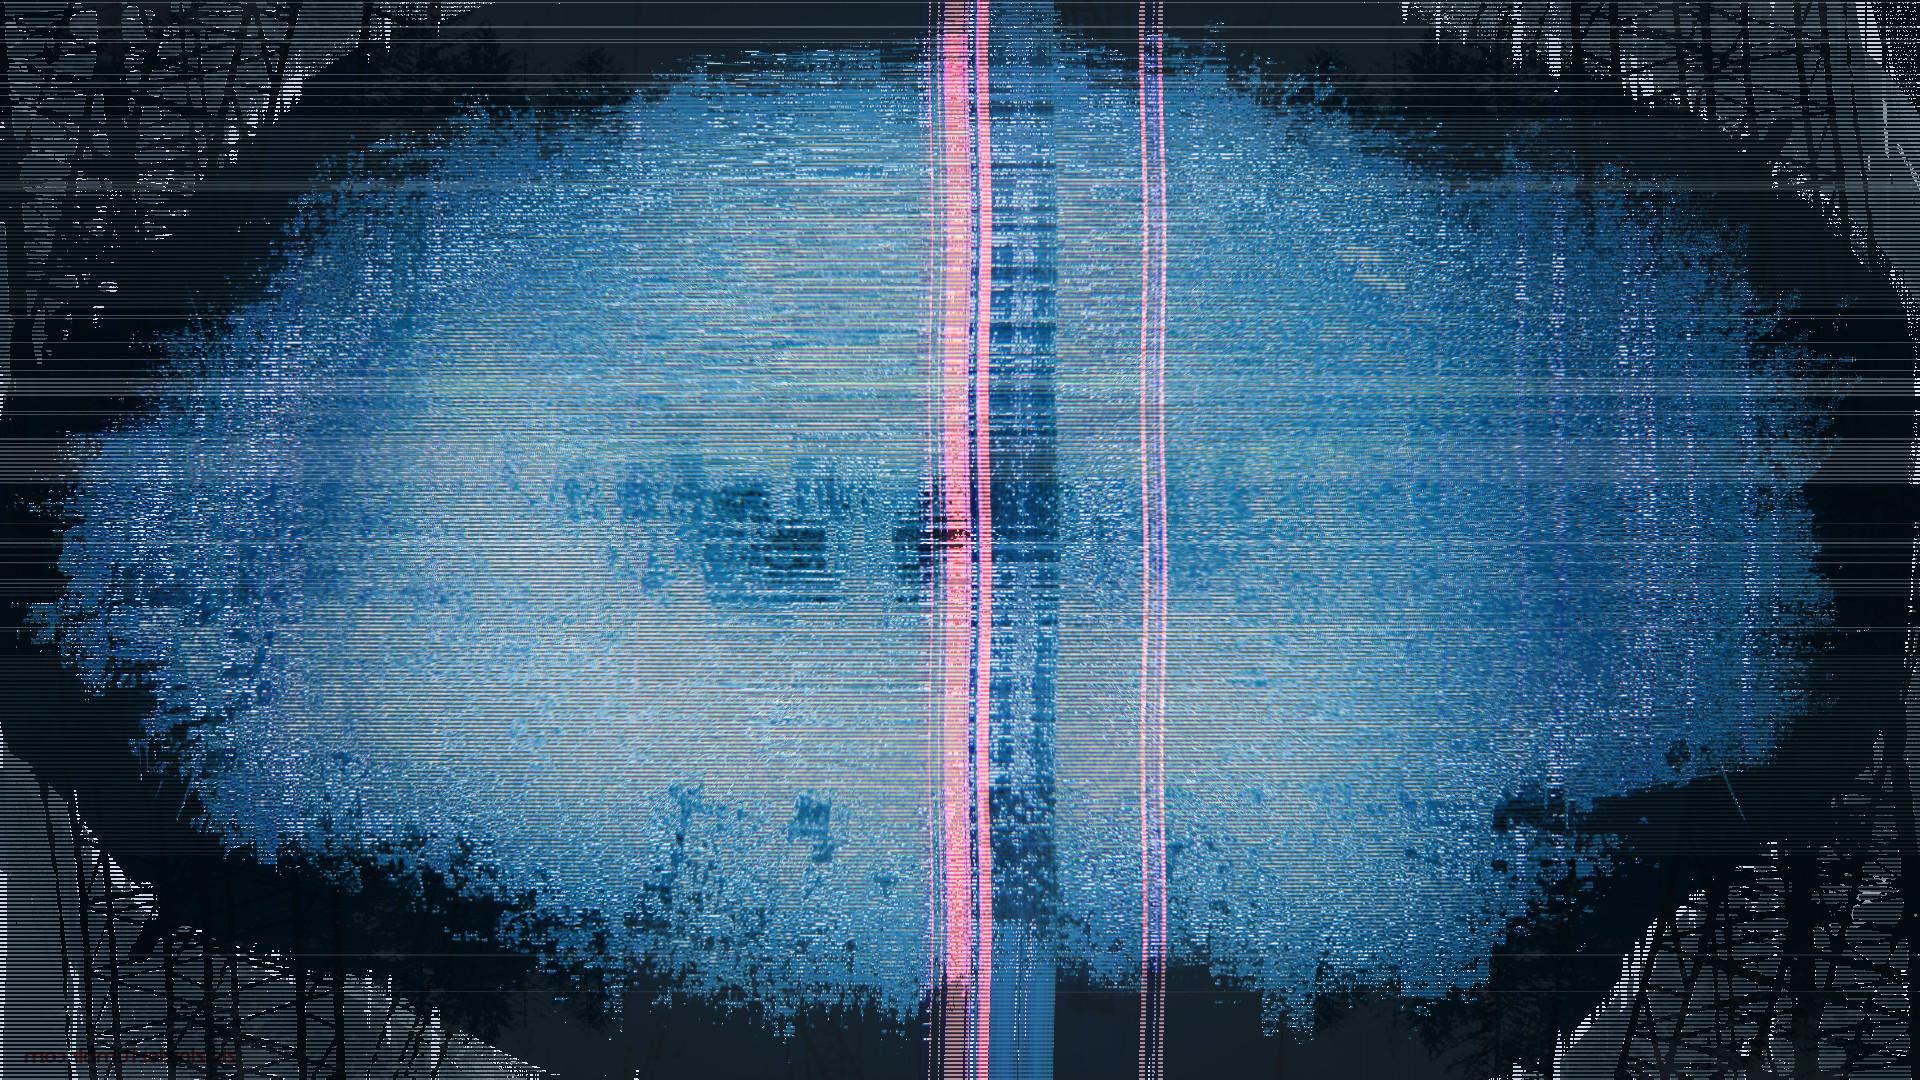 glitch Art, Abstract, LSD